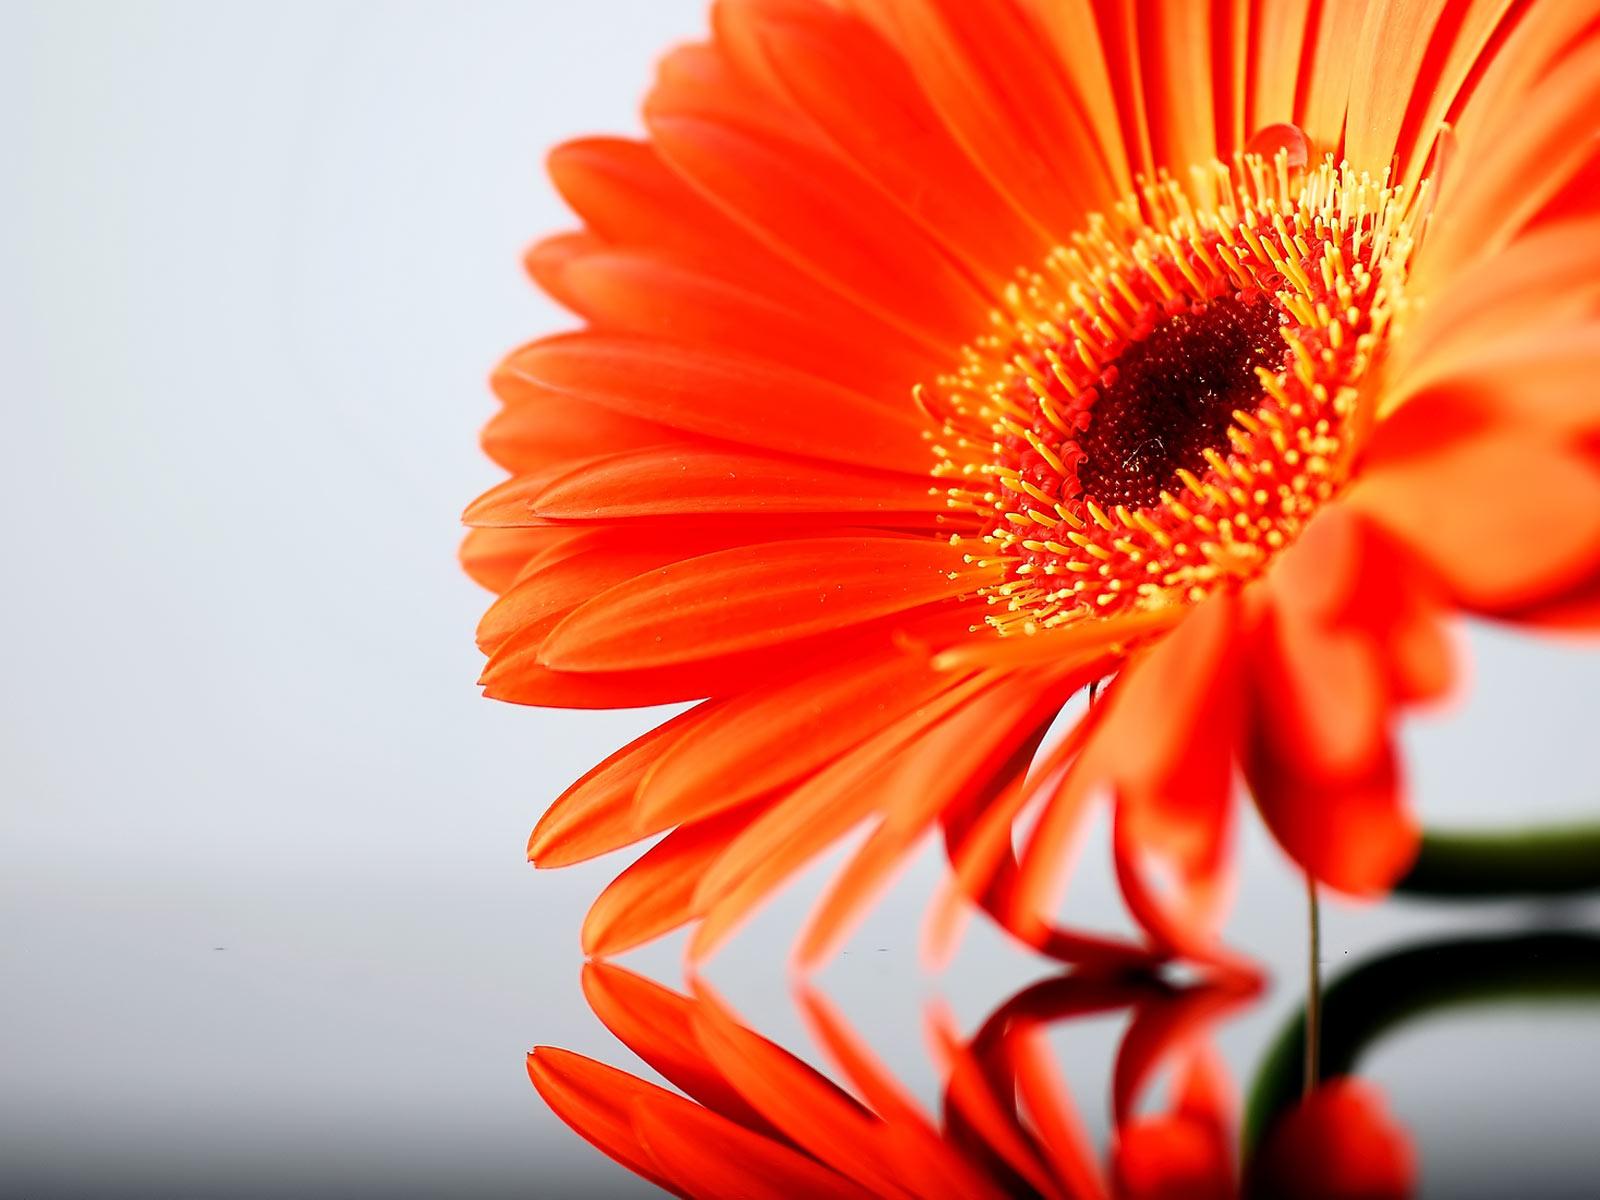 Flowers wallpapers orange flowers wallpapers - Gerber daisy wallpaper ...